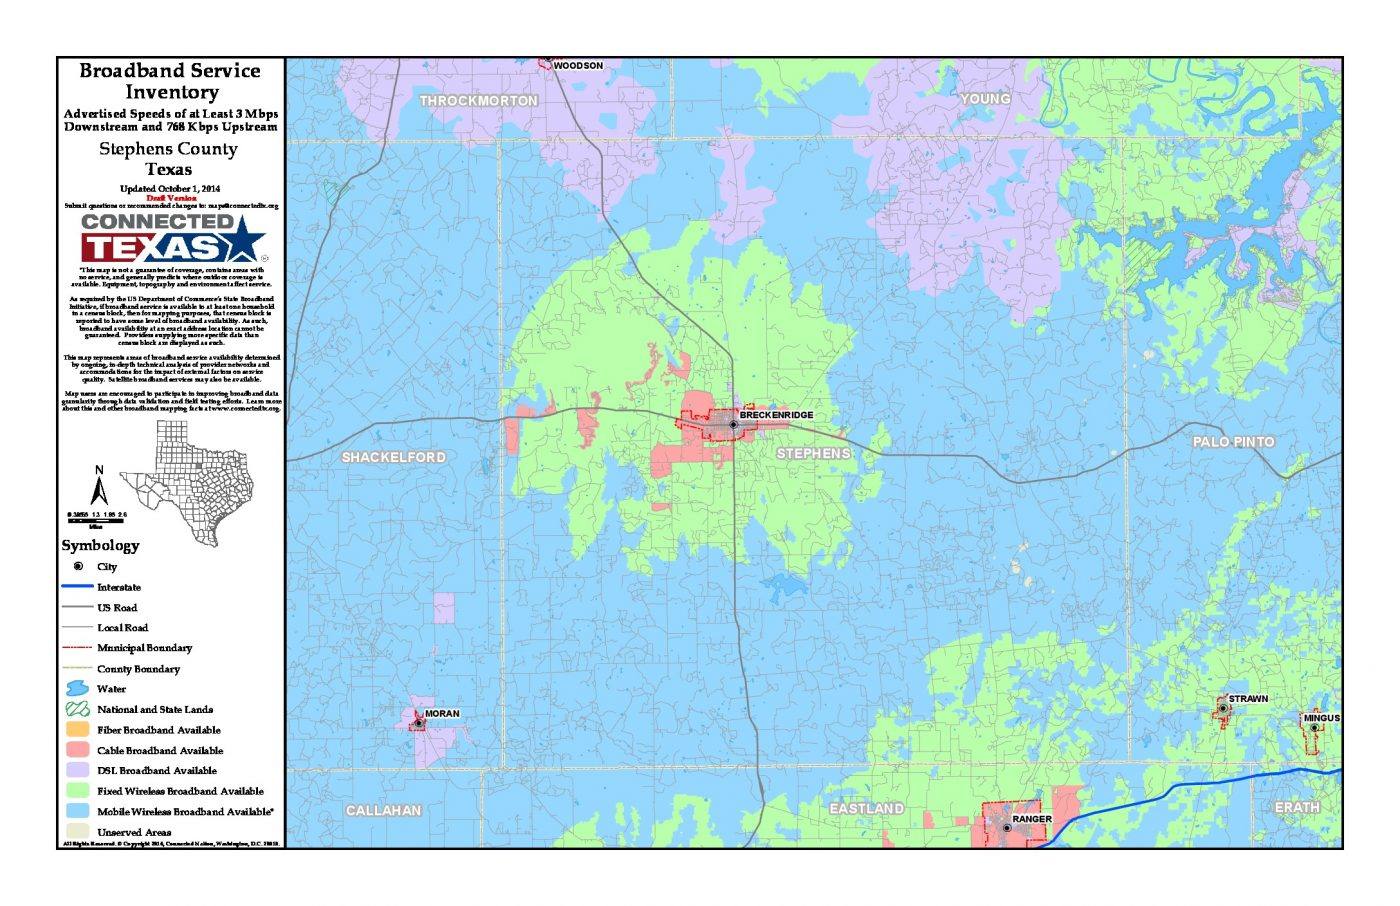 Broadband3M_Stephens - Connected Texas